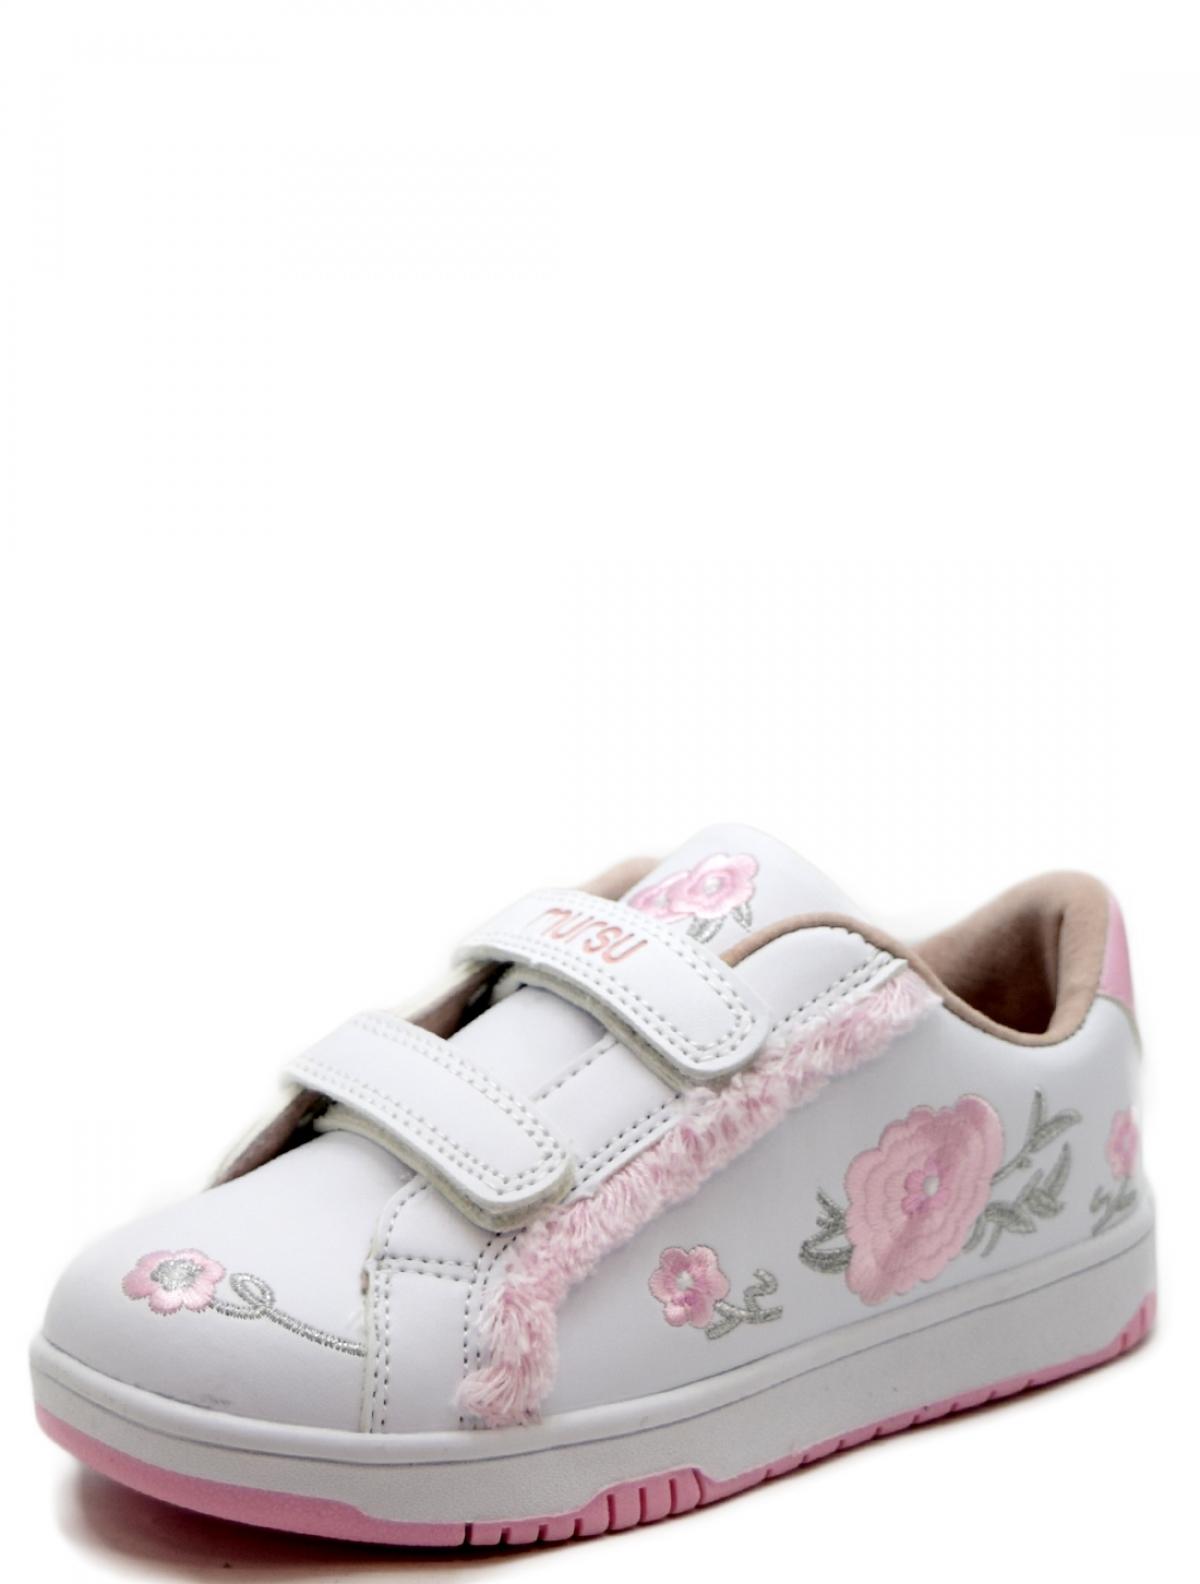 Mursu 208699 кроссовки для девочки